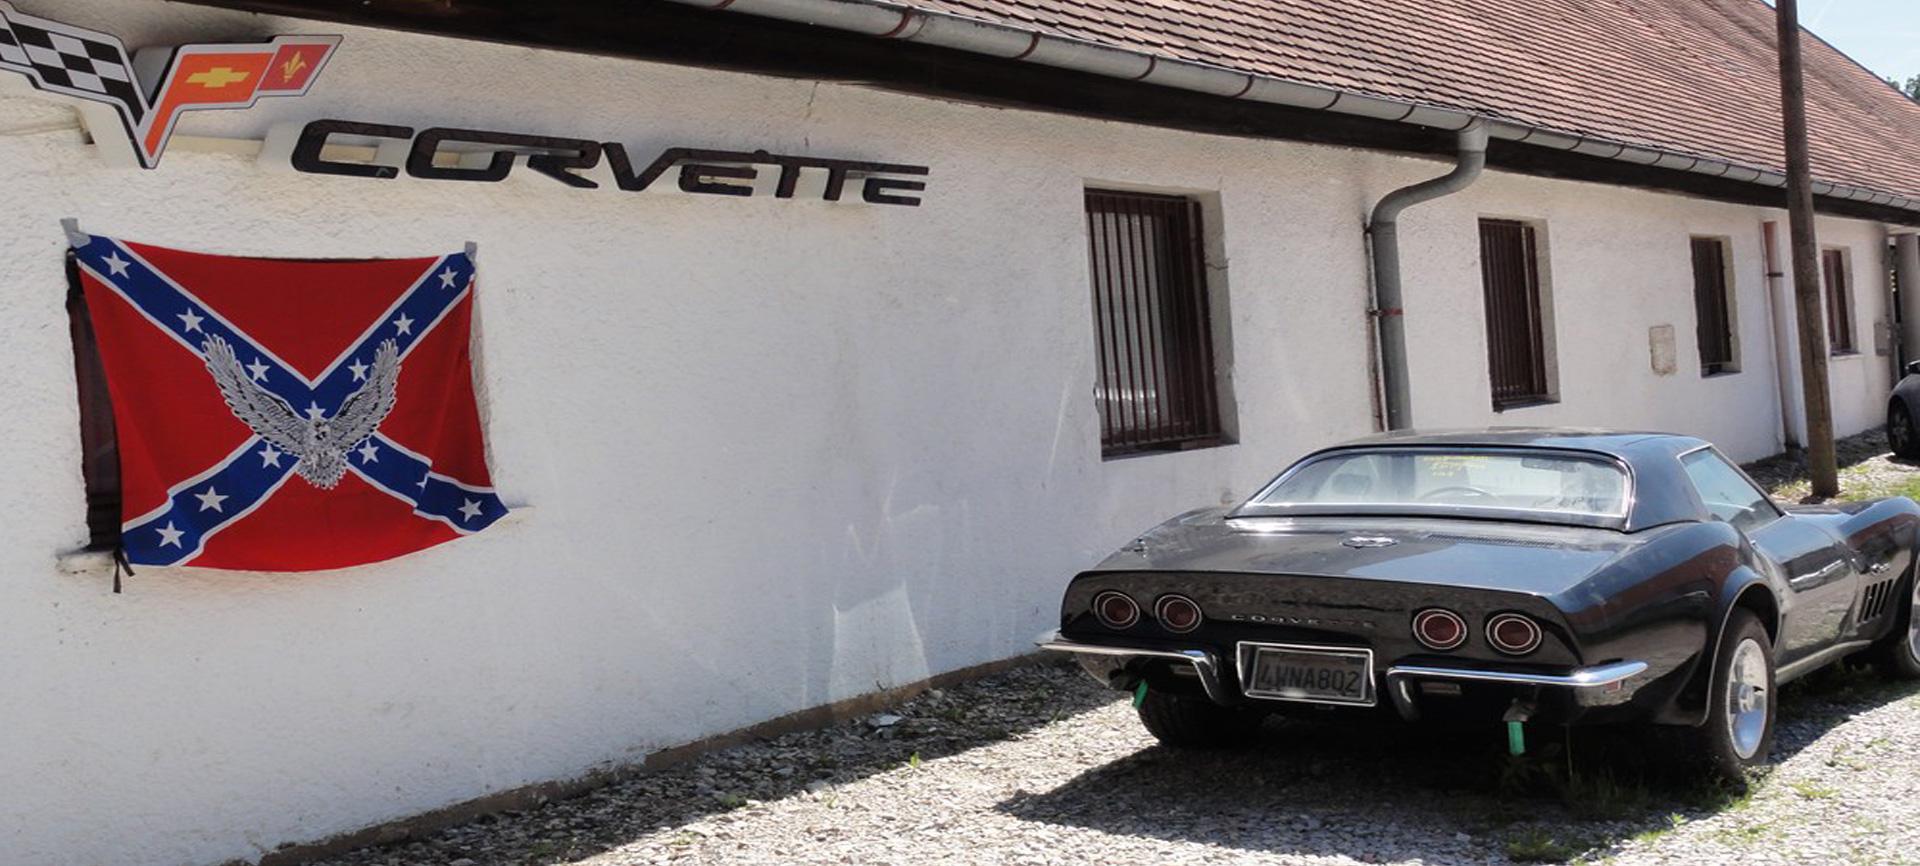 kontakt berger cars werkstatt f r corvette mustang u a us fahrzeuge m nchen. Black Bedroom Furniture Sets. Home Design Ideas